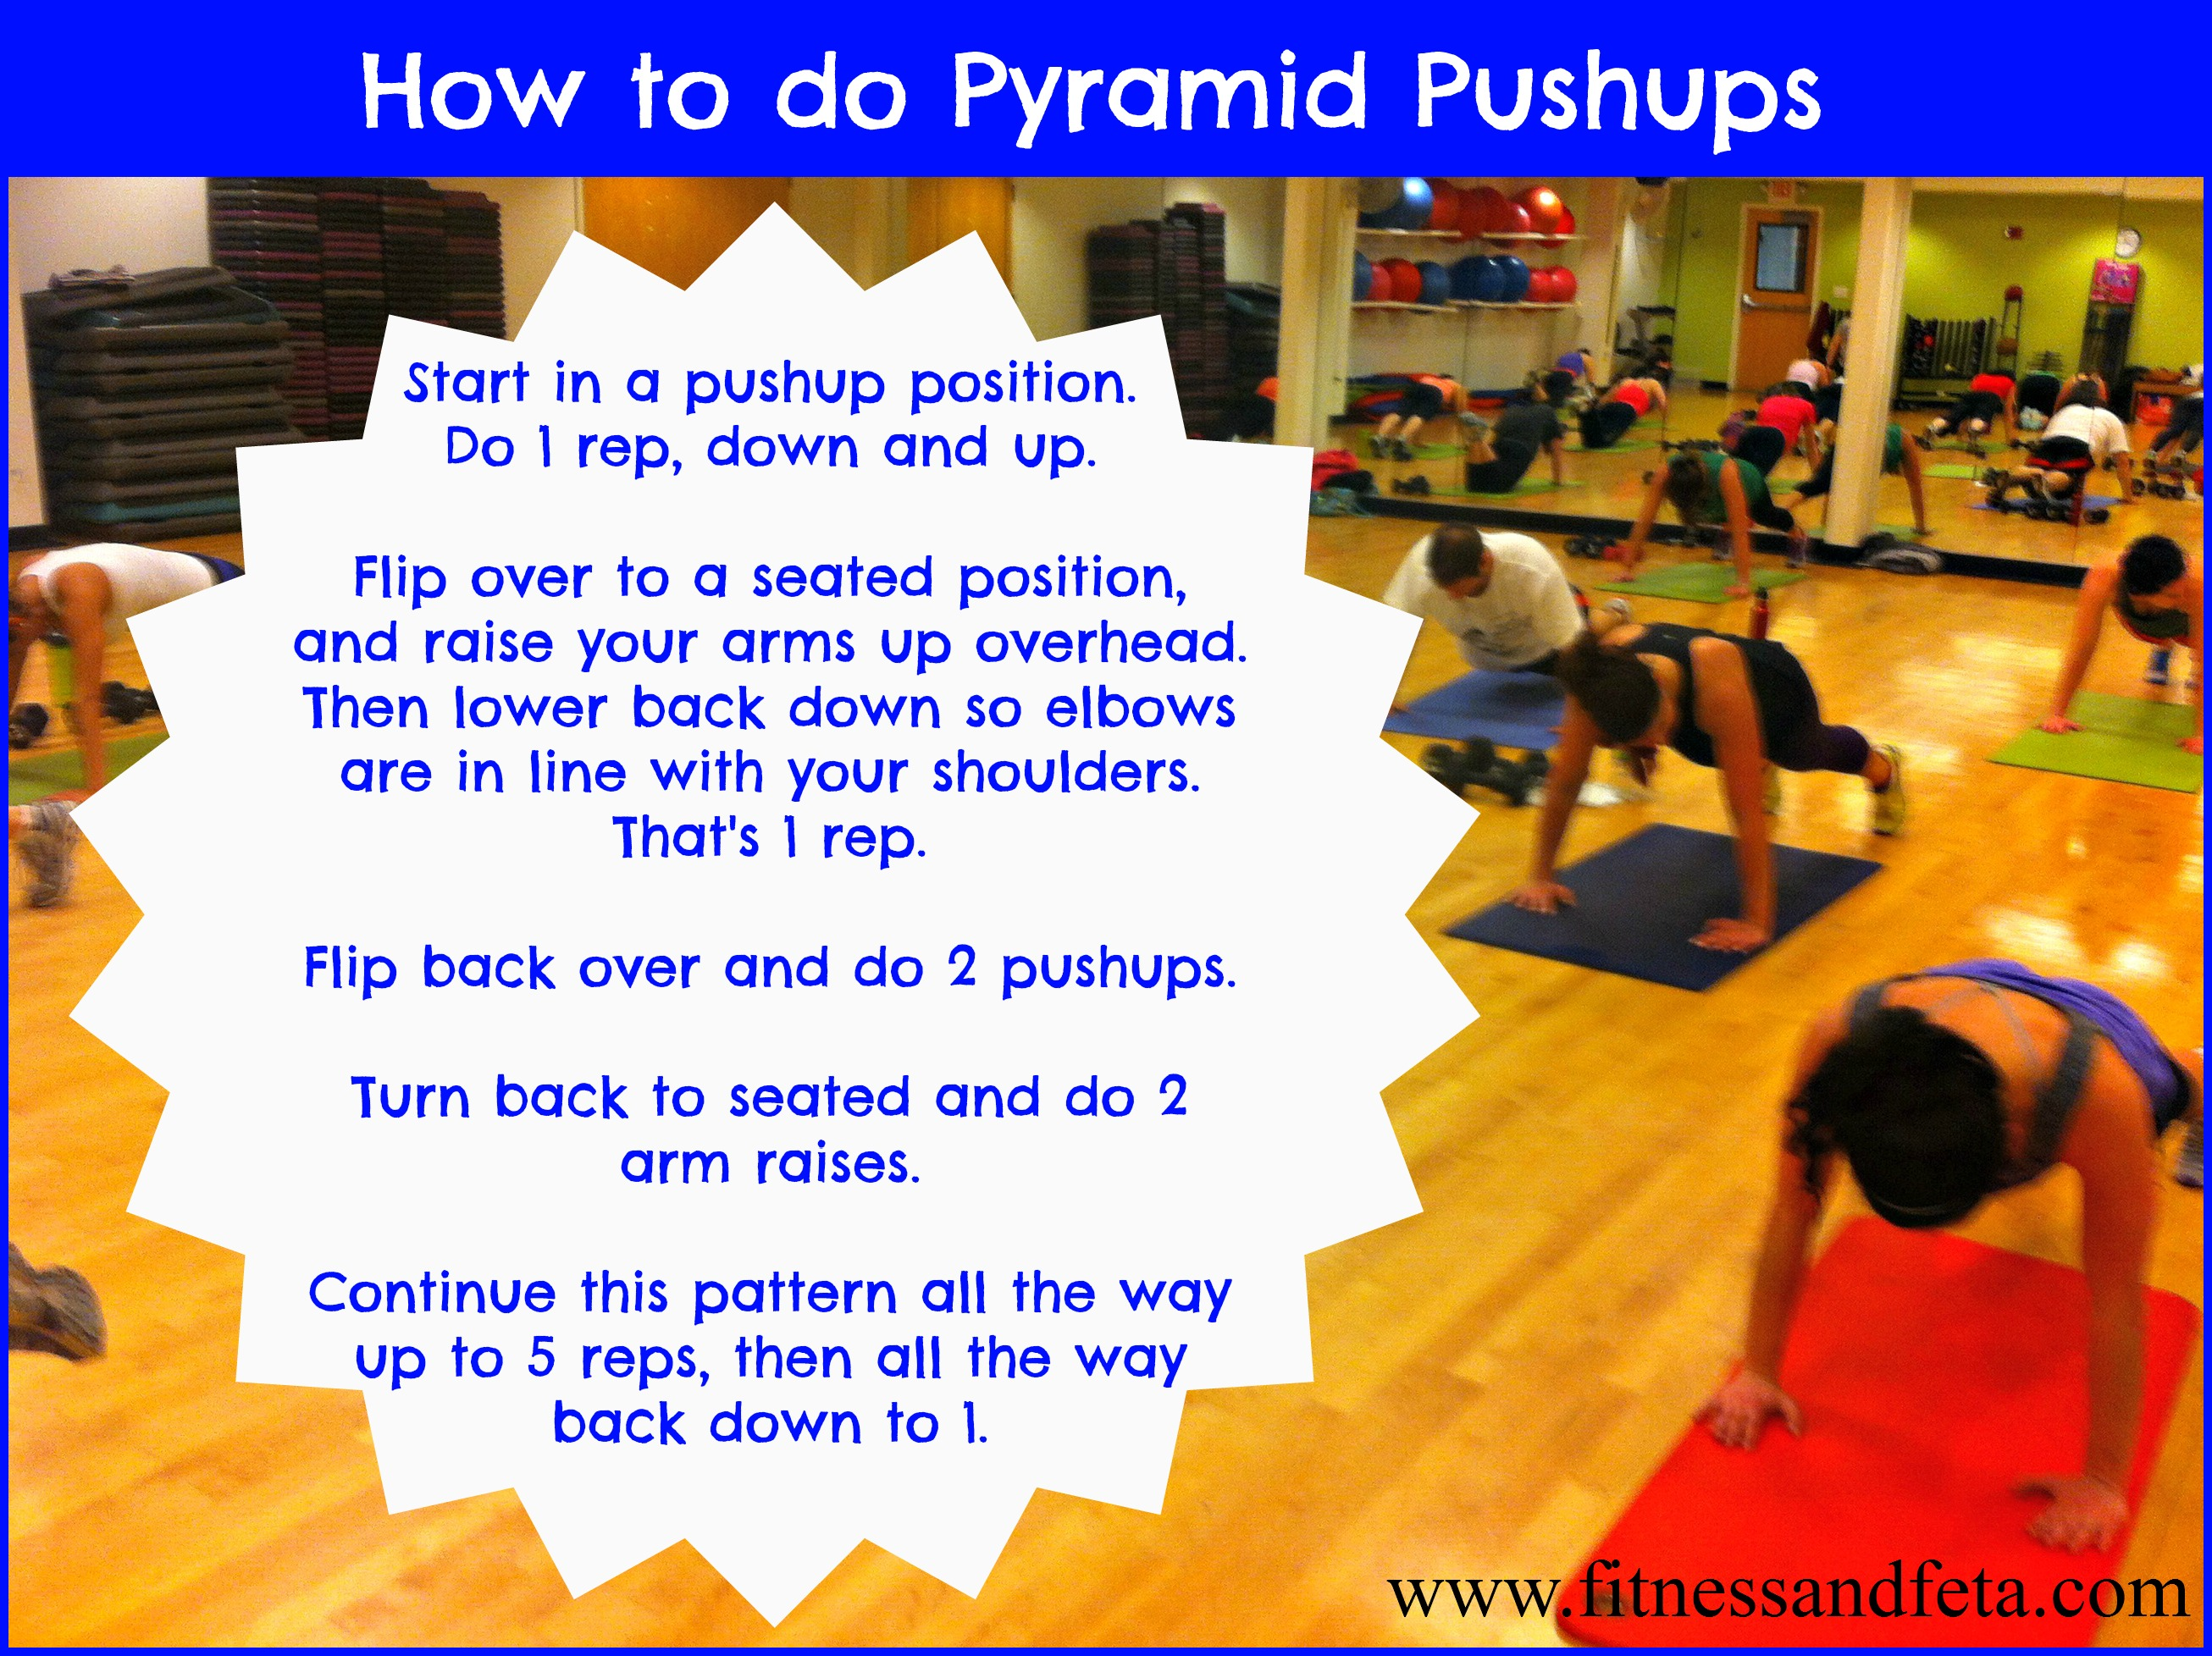 How to do pyramid pushups